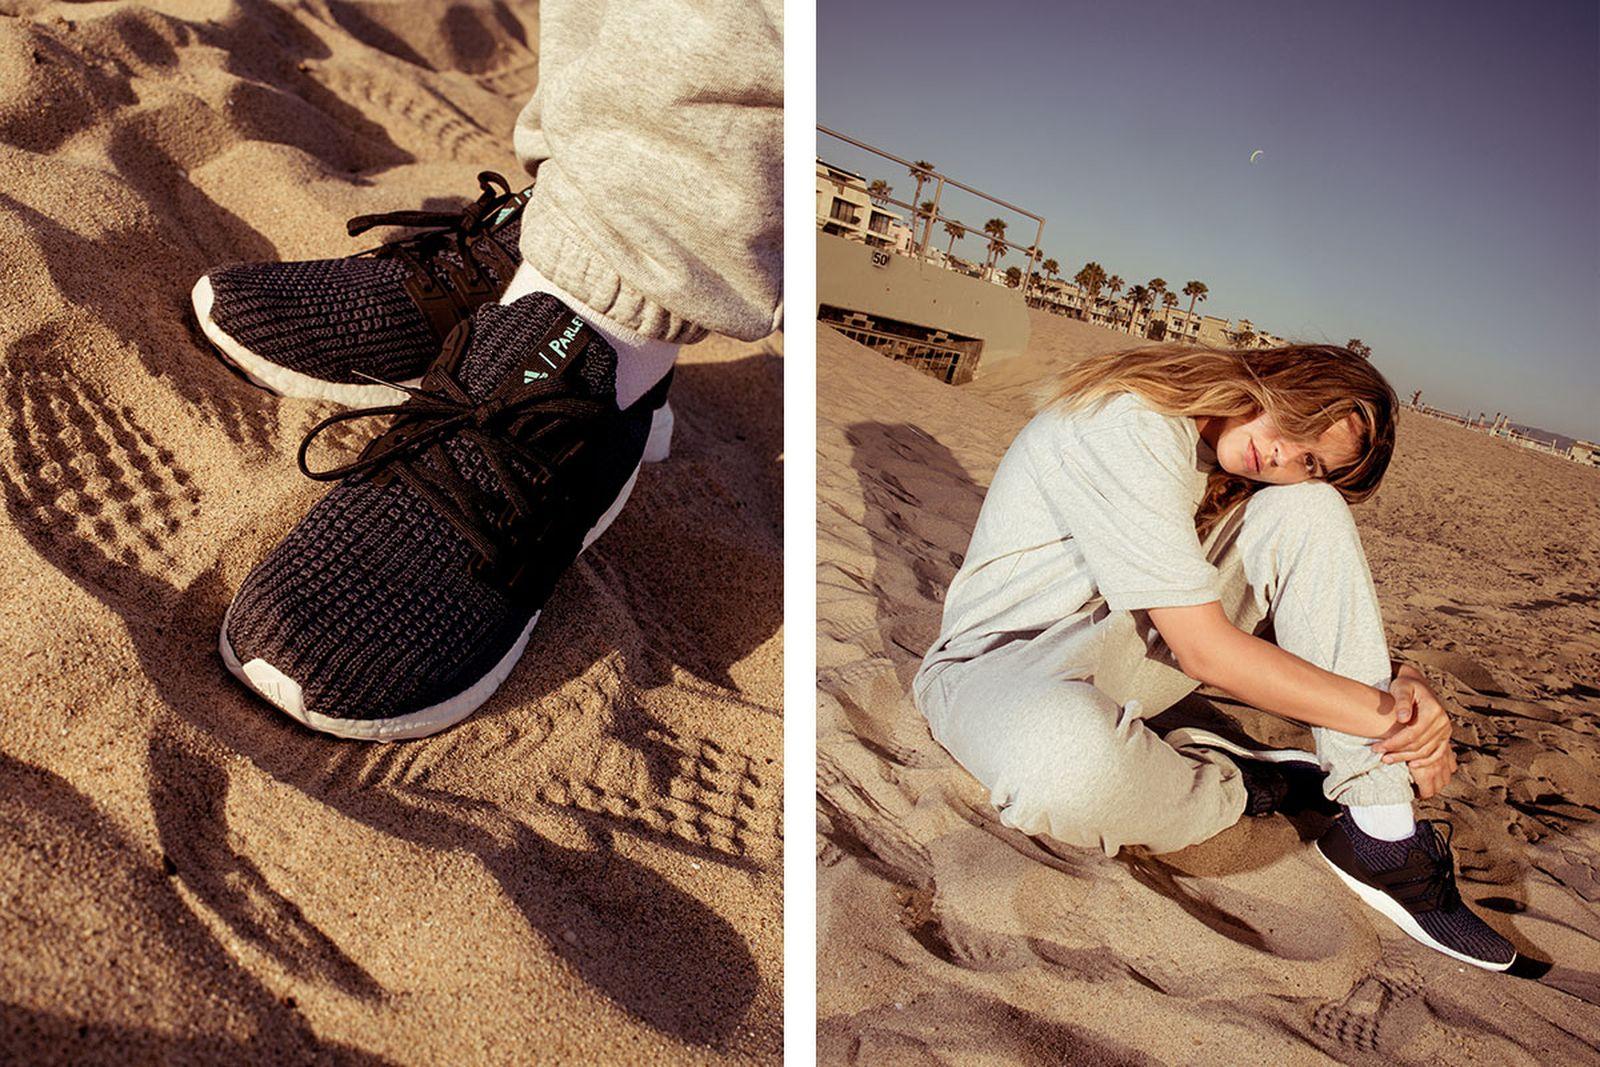 adidas parley ultraboost deep ocean blue lookbook adidas Running parley for the oceans